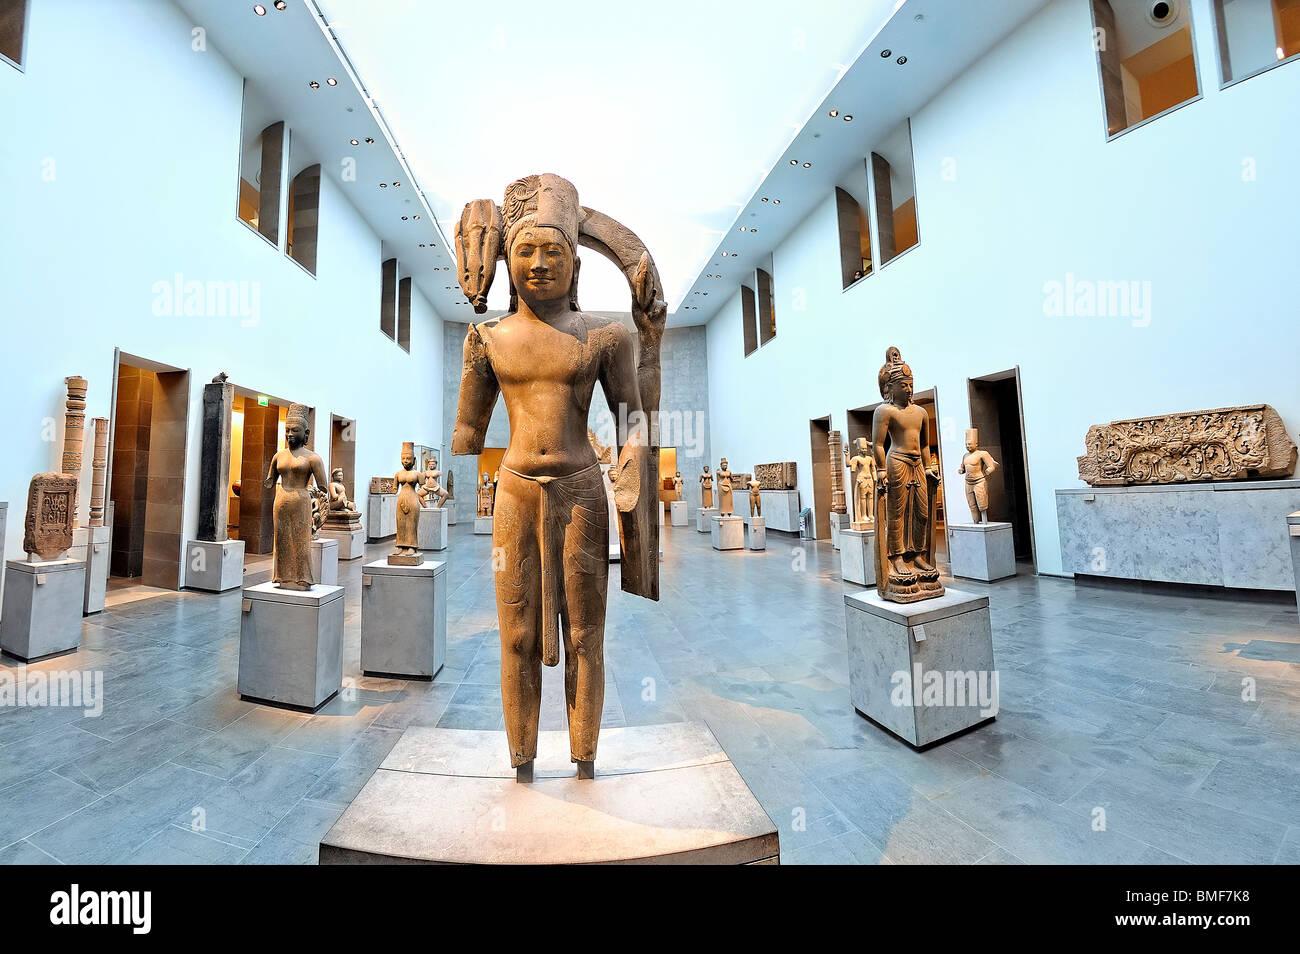 Guimet Museum - Stock Image